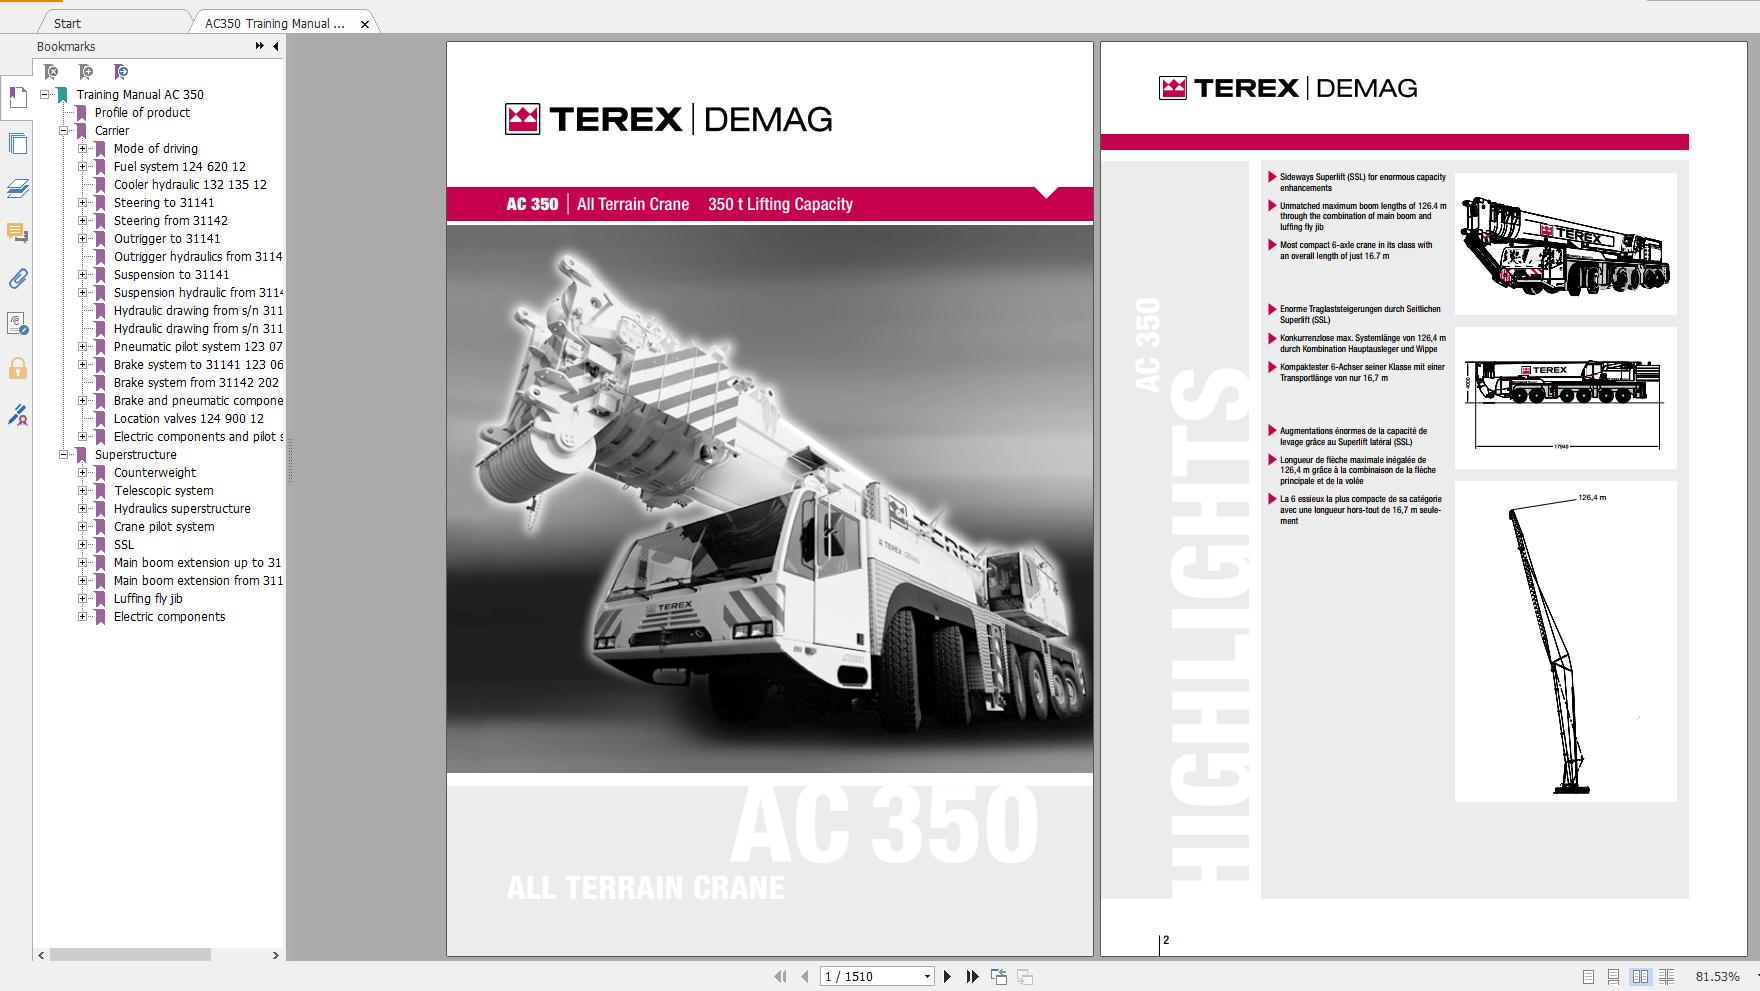 Terex Demag Mobile Crane AC350 400 ton Technical Manual, Operator Manual